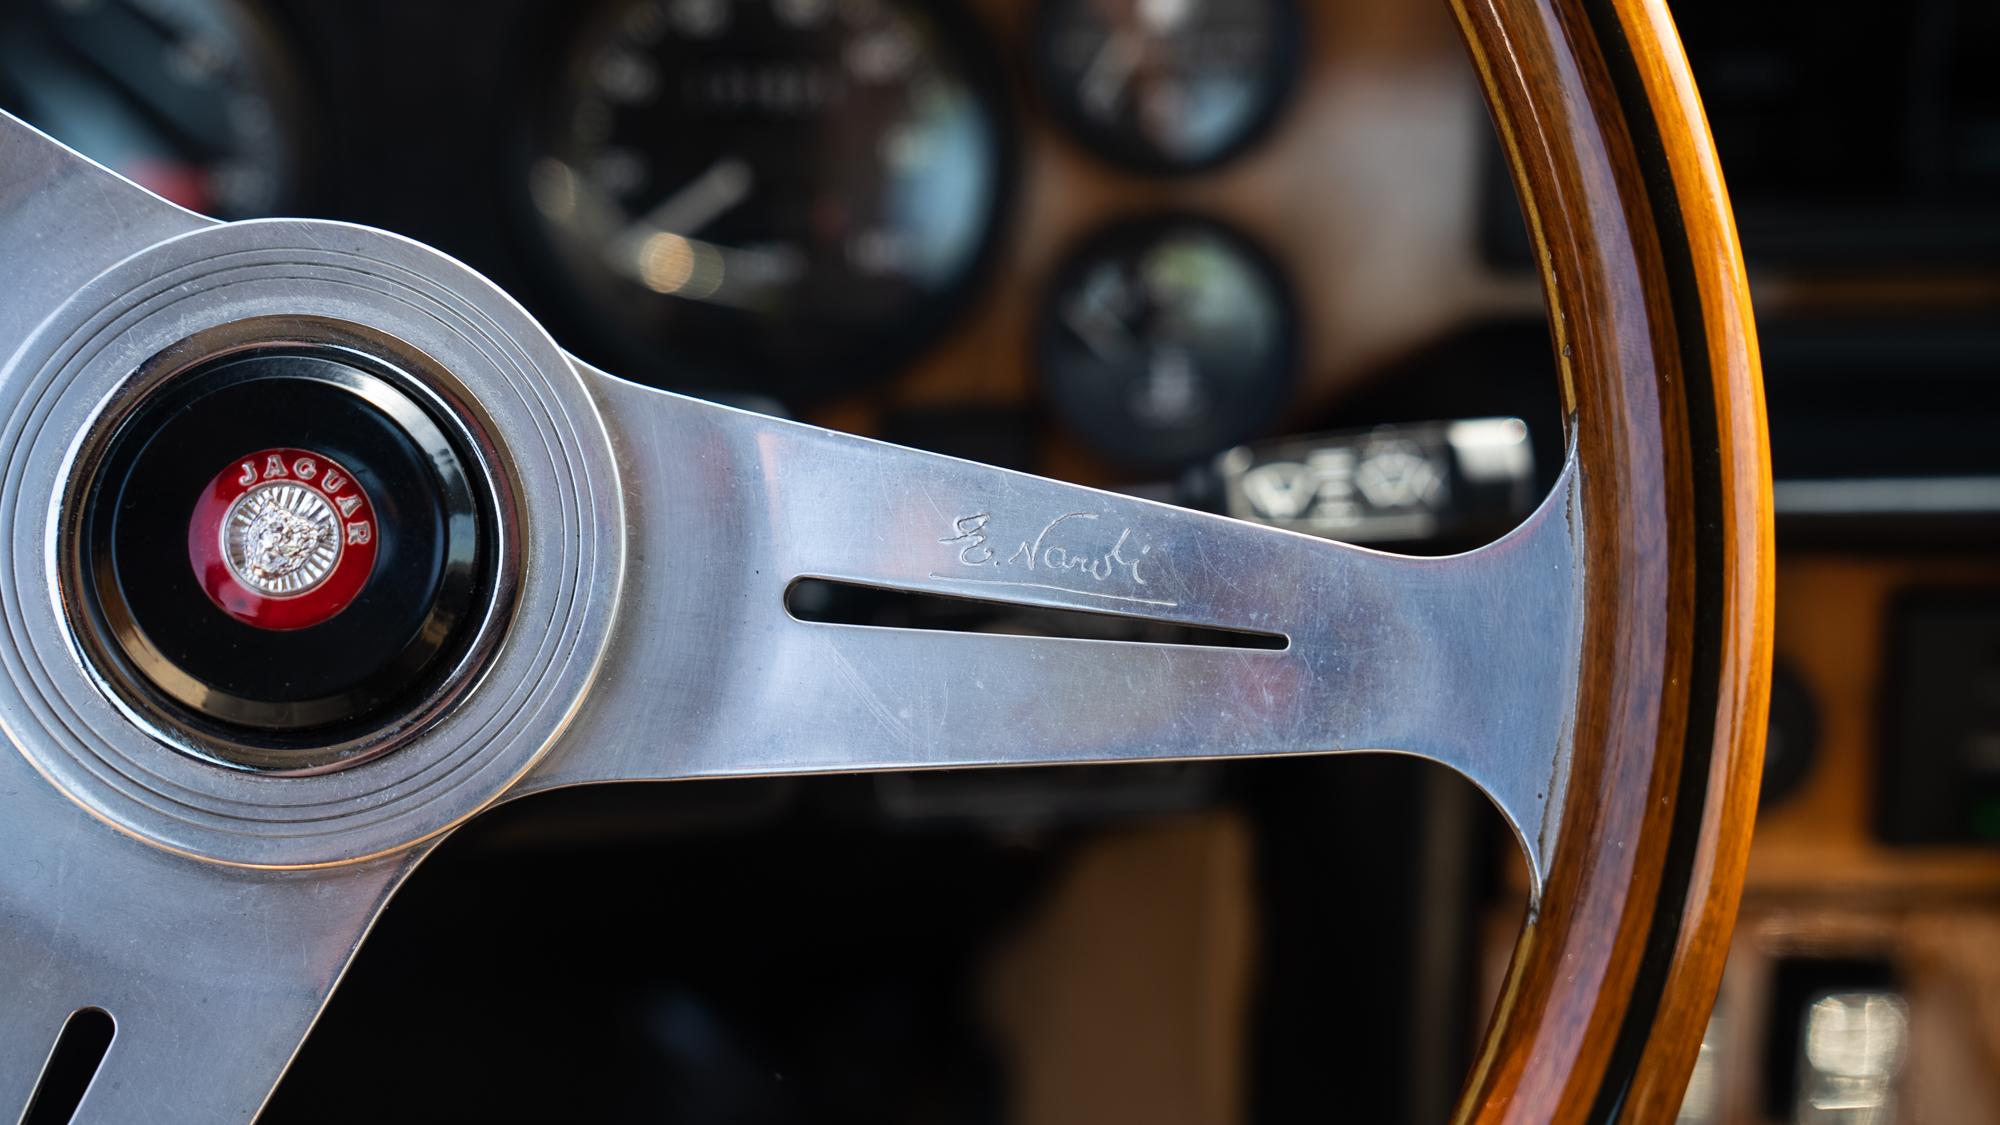 1986 Jaguar XJ6 steering wheel